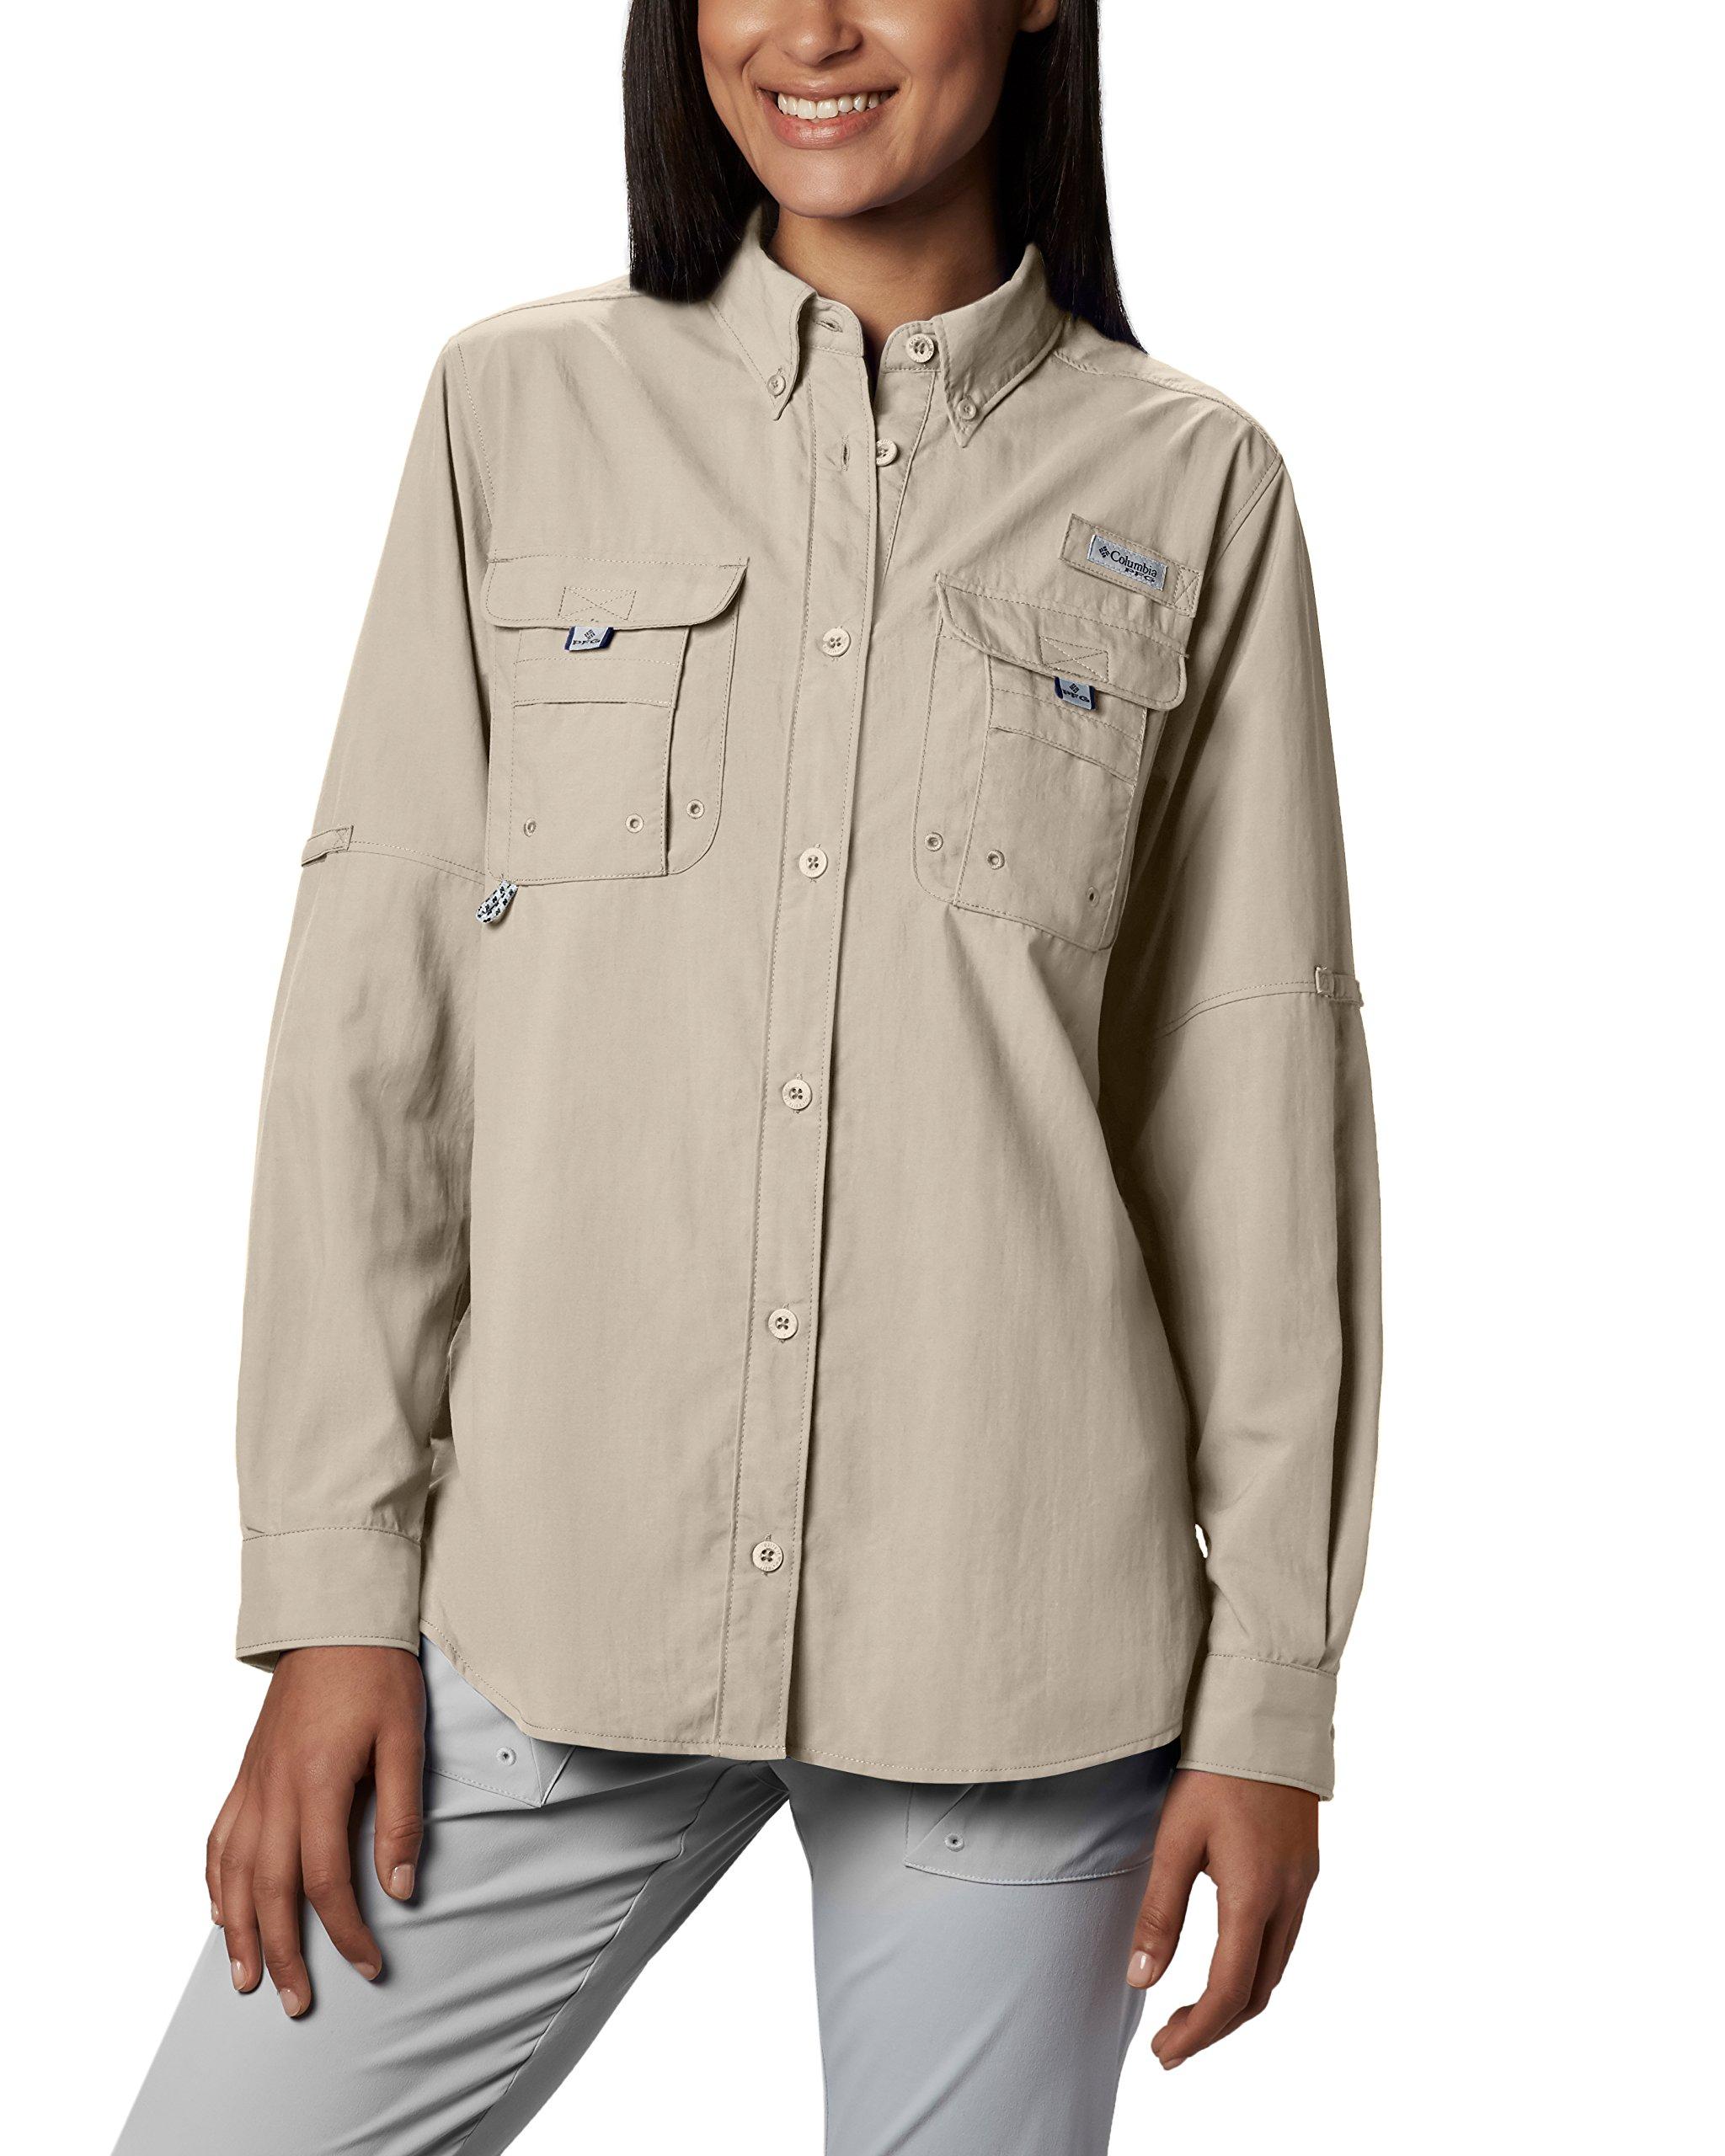 Columbia Women's Bahama Long Sleeve Shirt, Fossil, X-Small